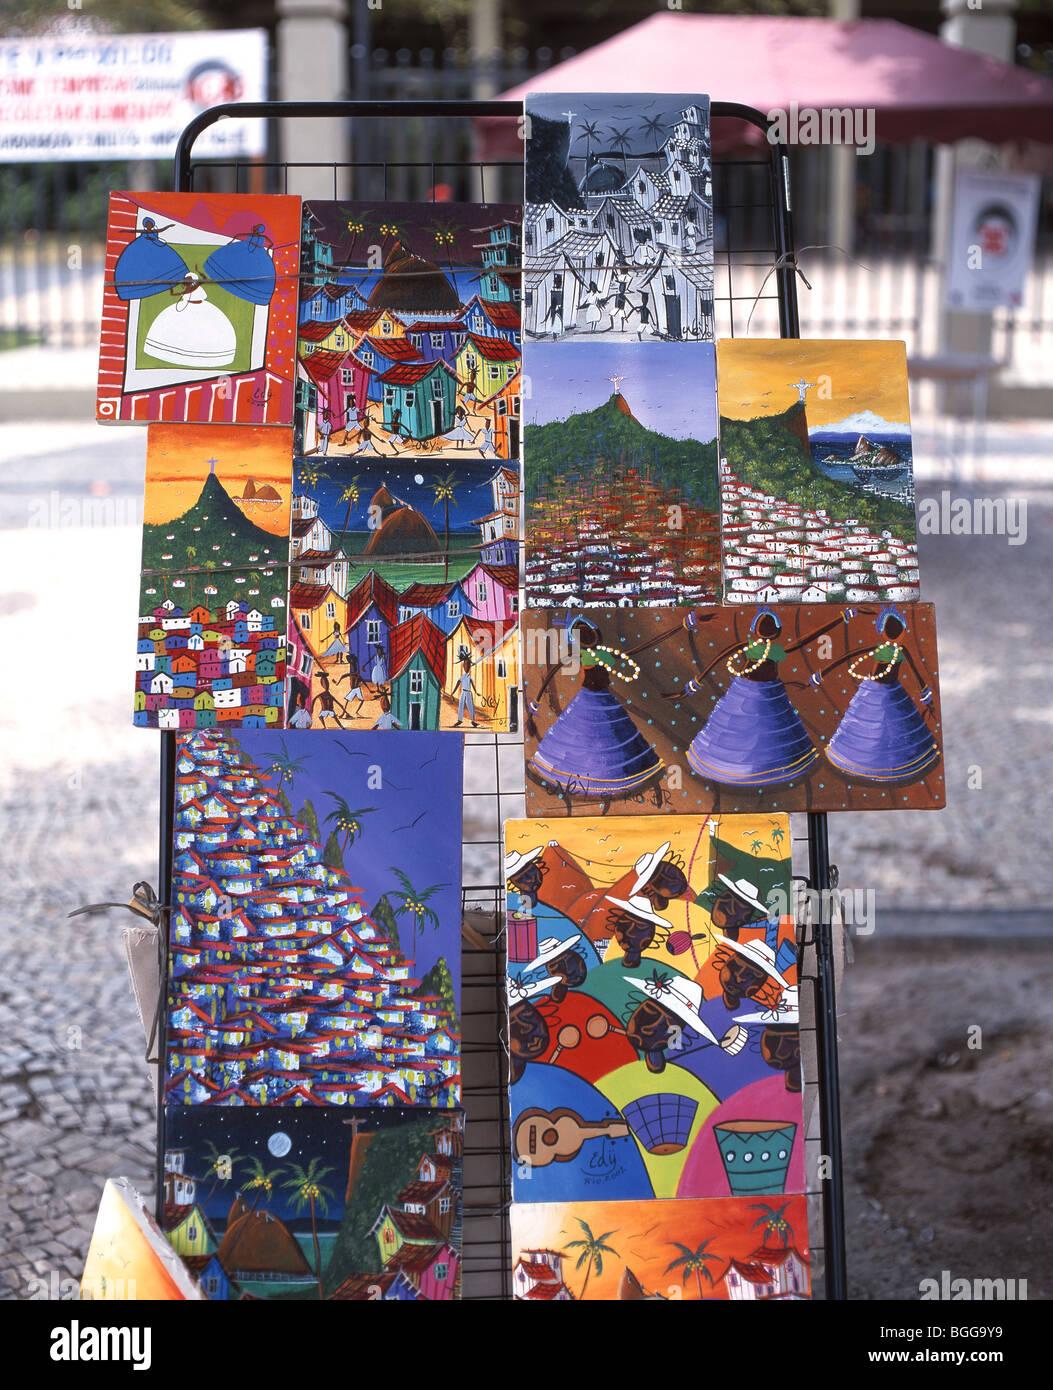 Peintures A Vendre Au Marche Hippie Ipanema Beach Rio De Janeiro Rio De Janeiro Bresil De L Etat Photo Stock Alamy